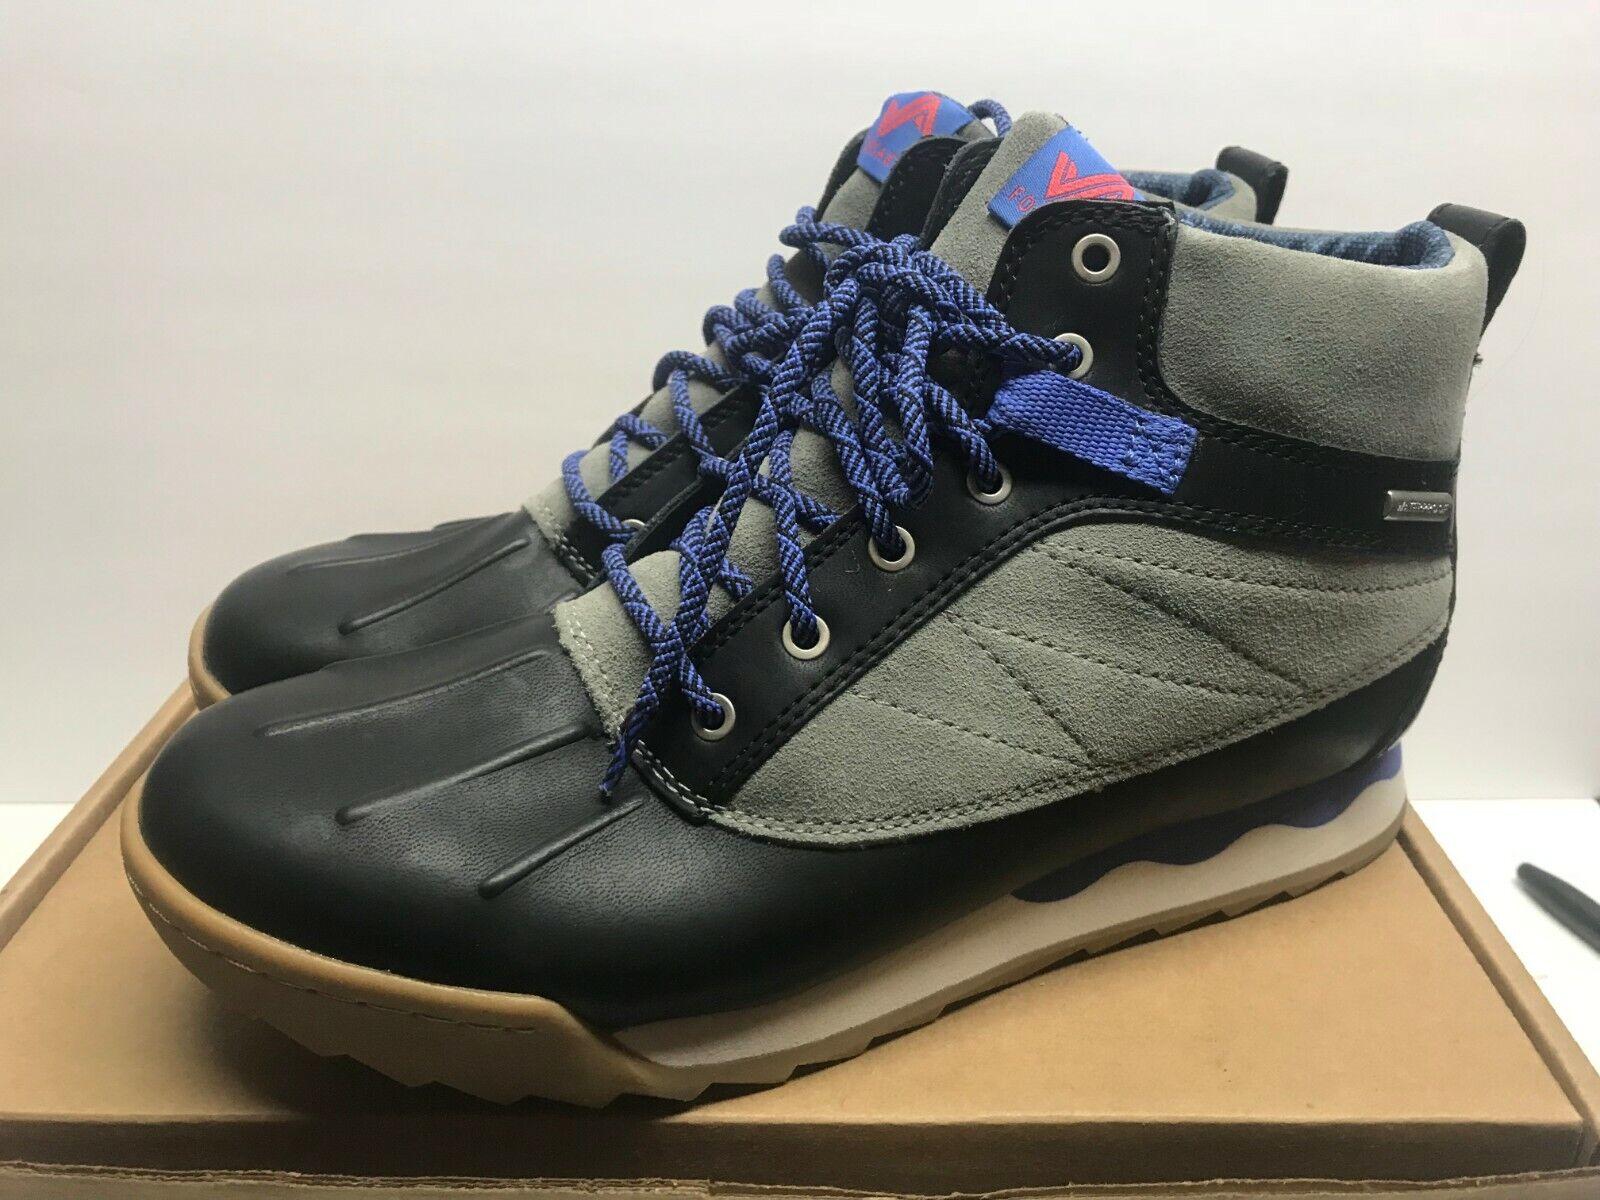 Forsake Duck 9.5 Womens Waterproof Leather Performance Sneaker Boot Black Stone